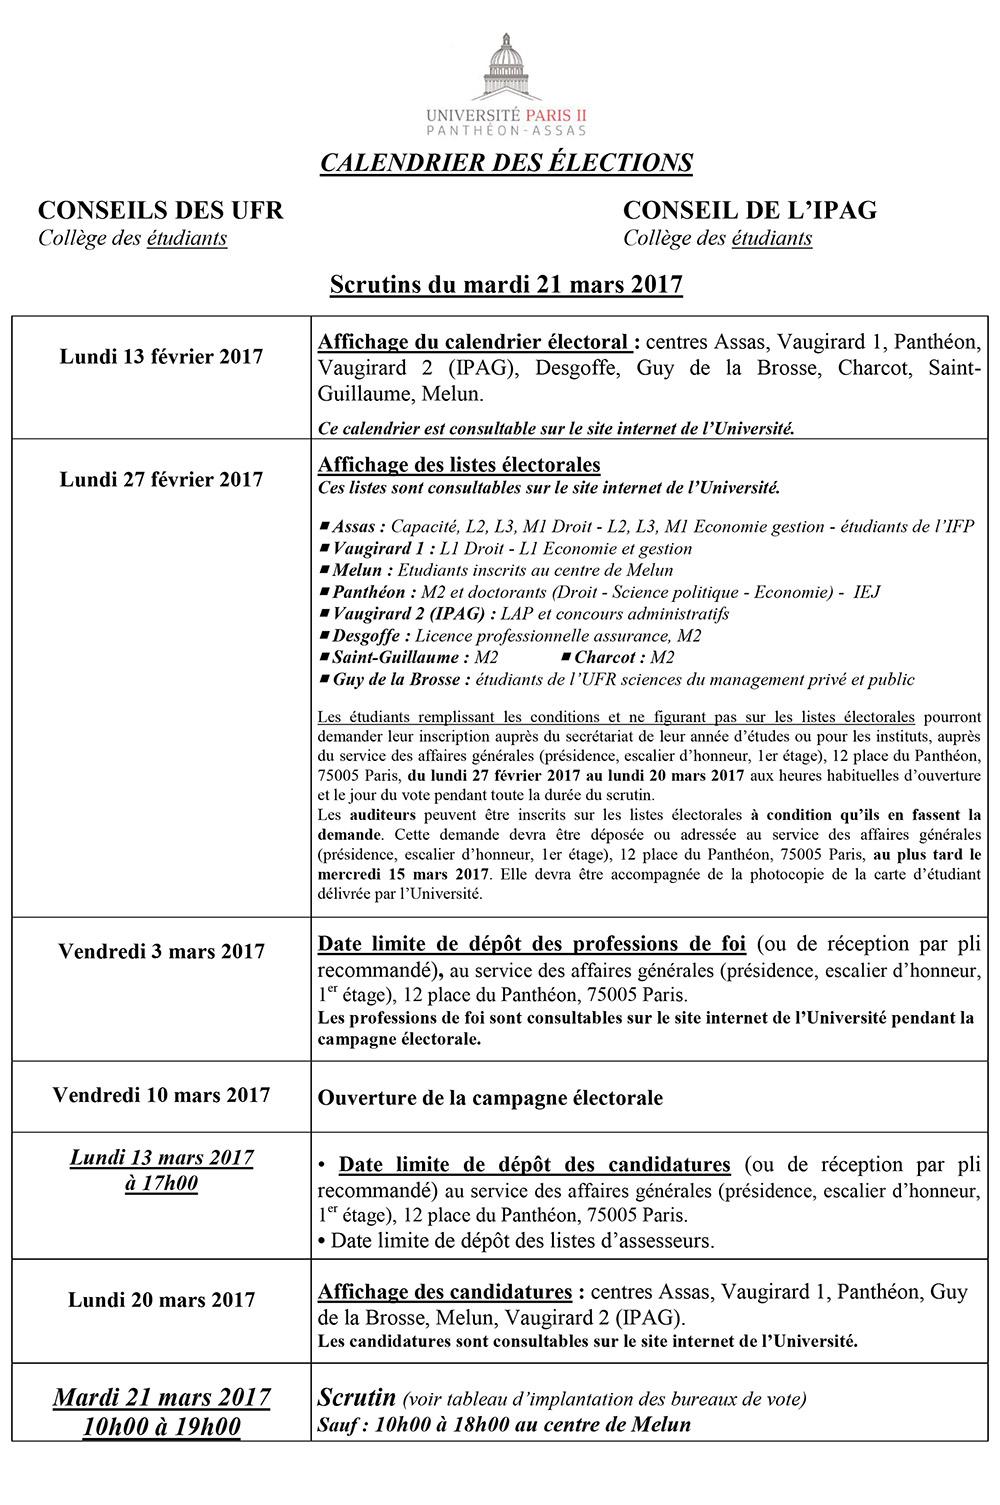 Calendrier-electoral-scrutin-mars-2017